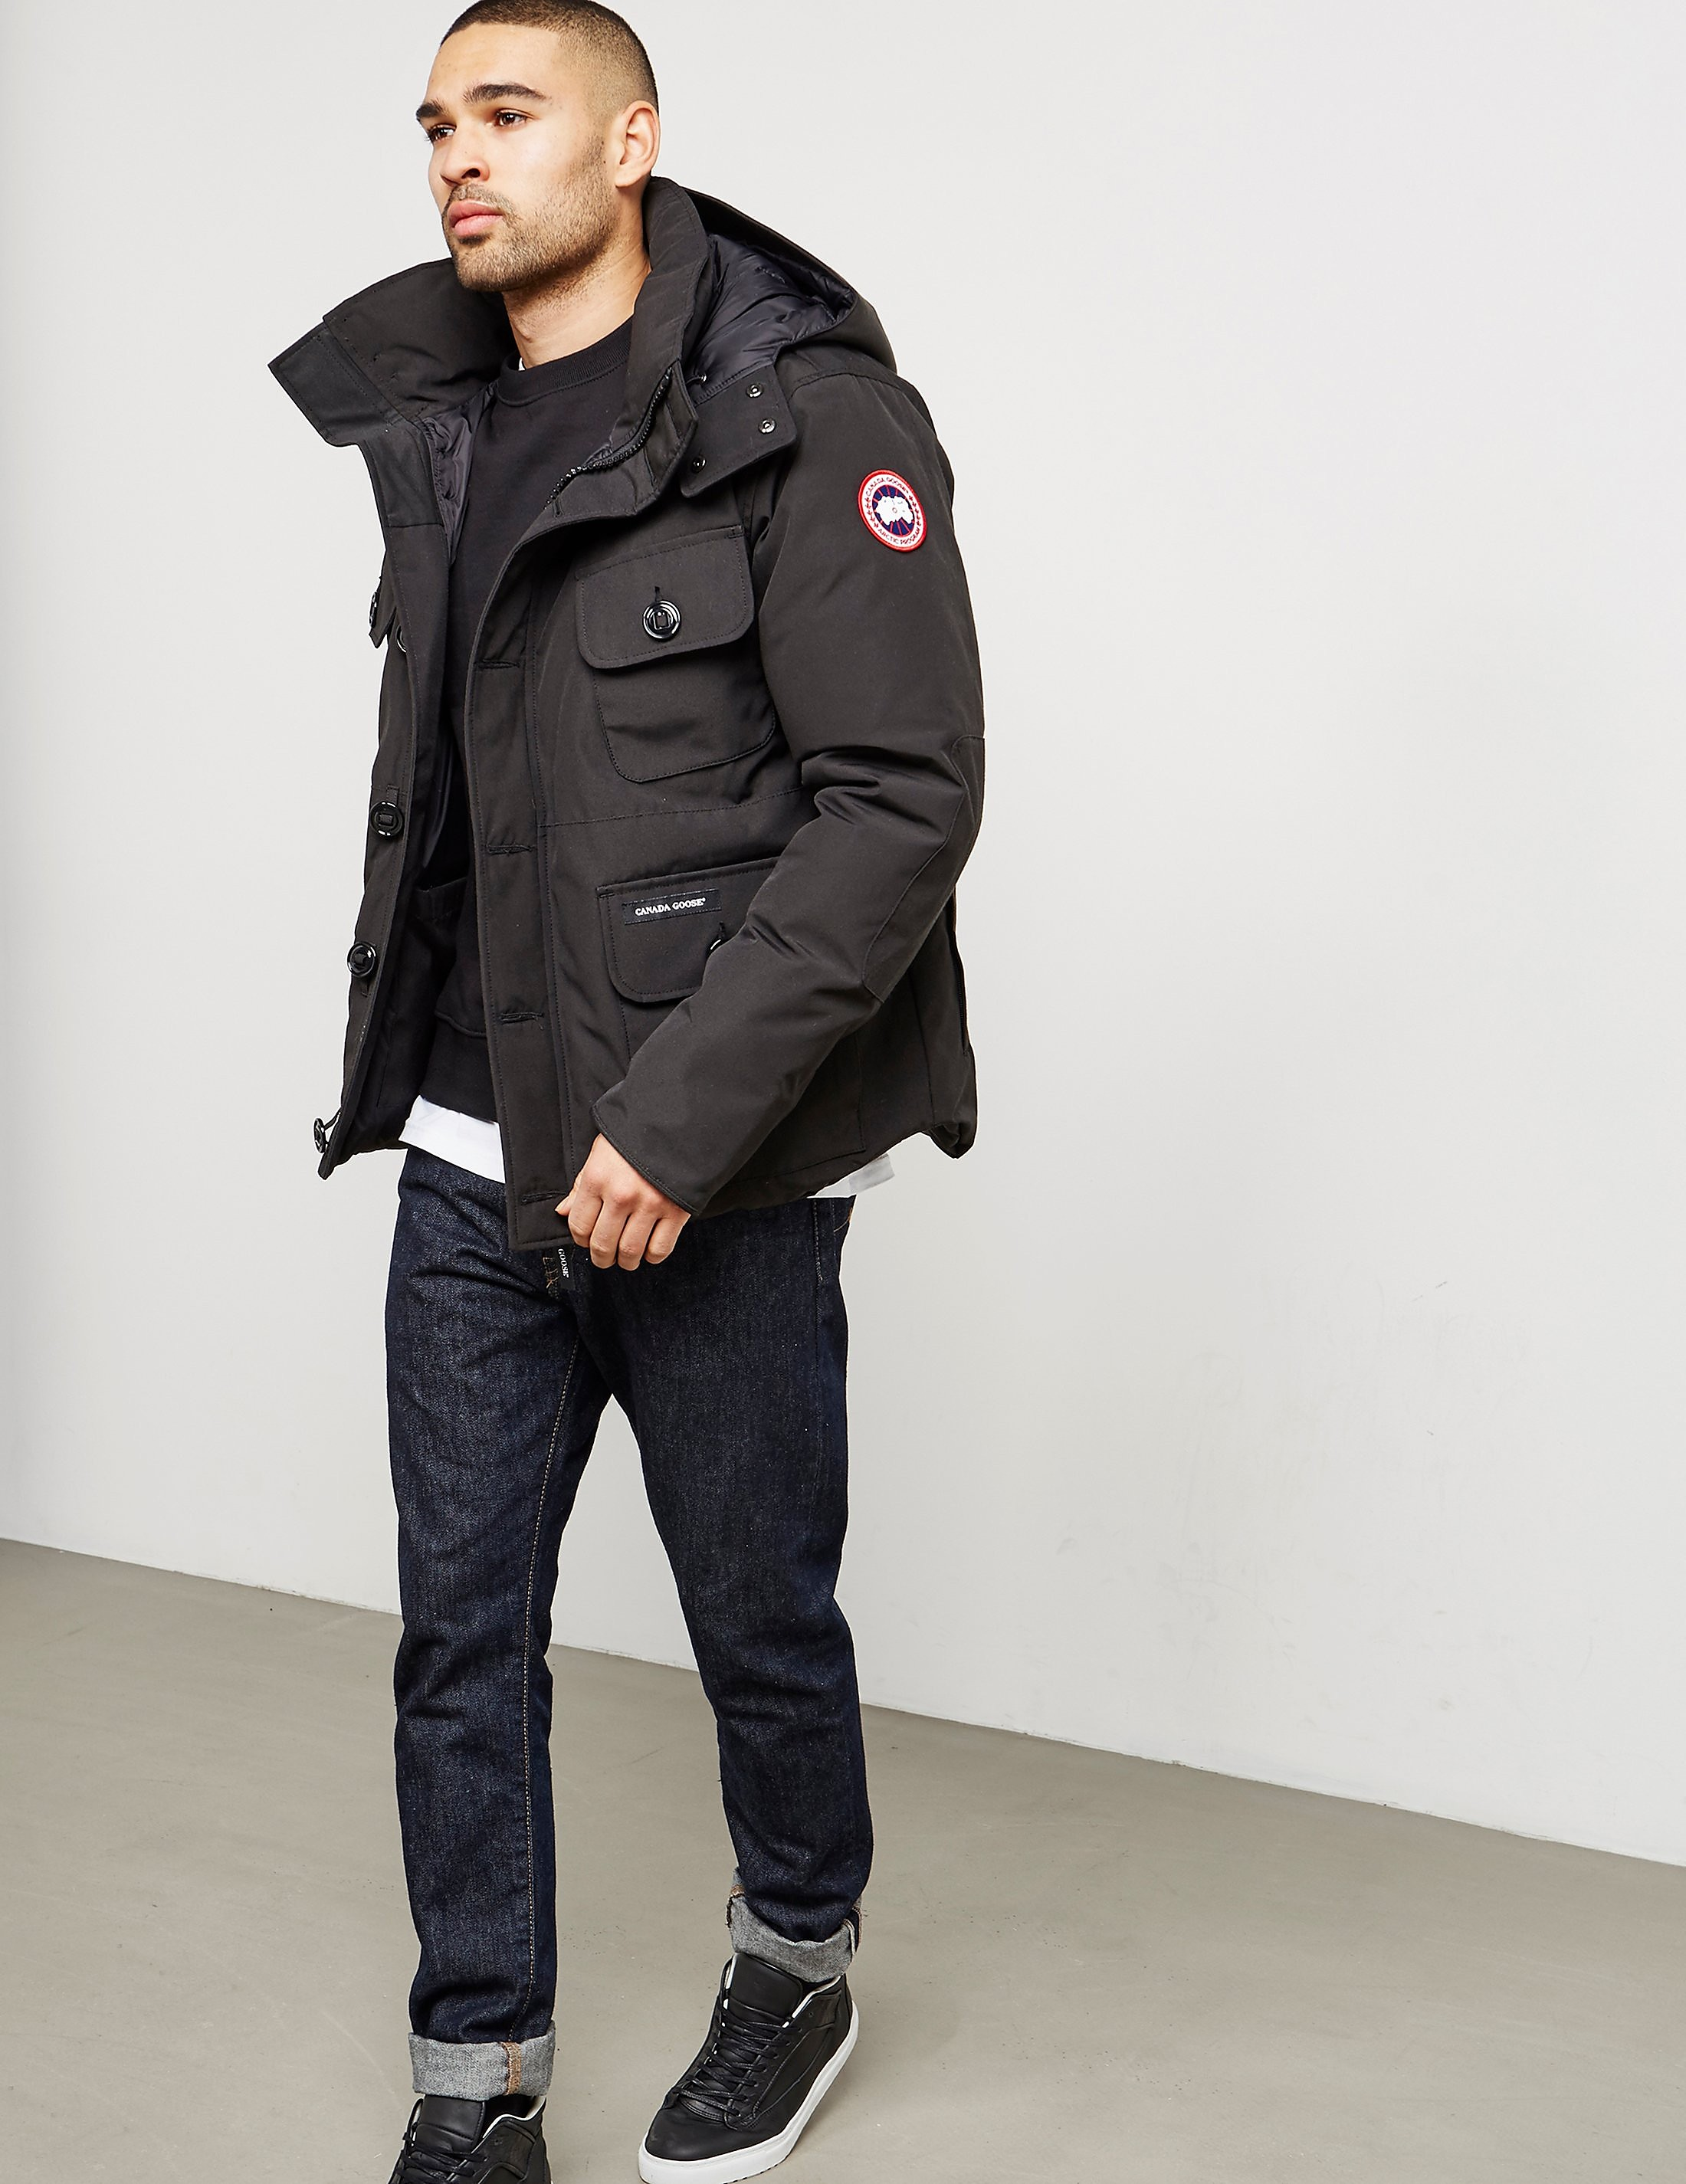 Canada Goose Selkirk Jacket